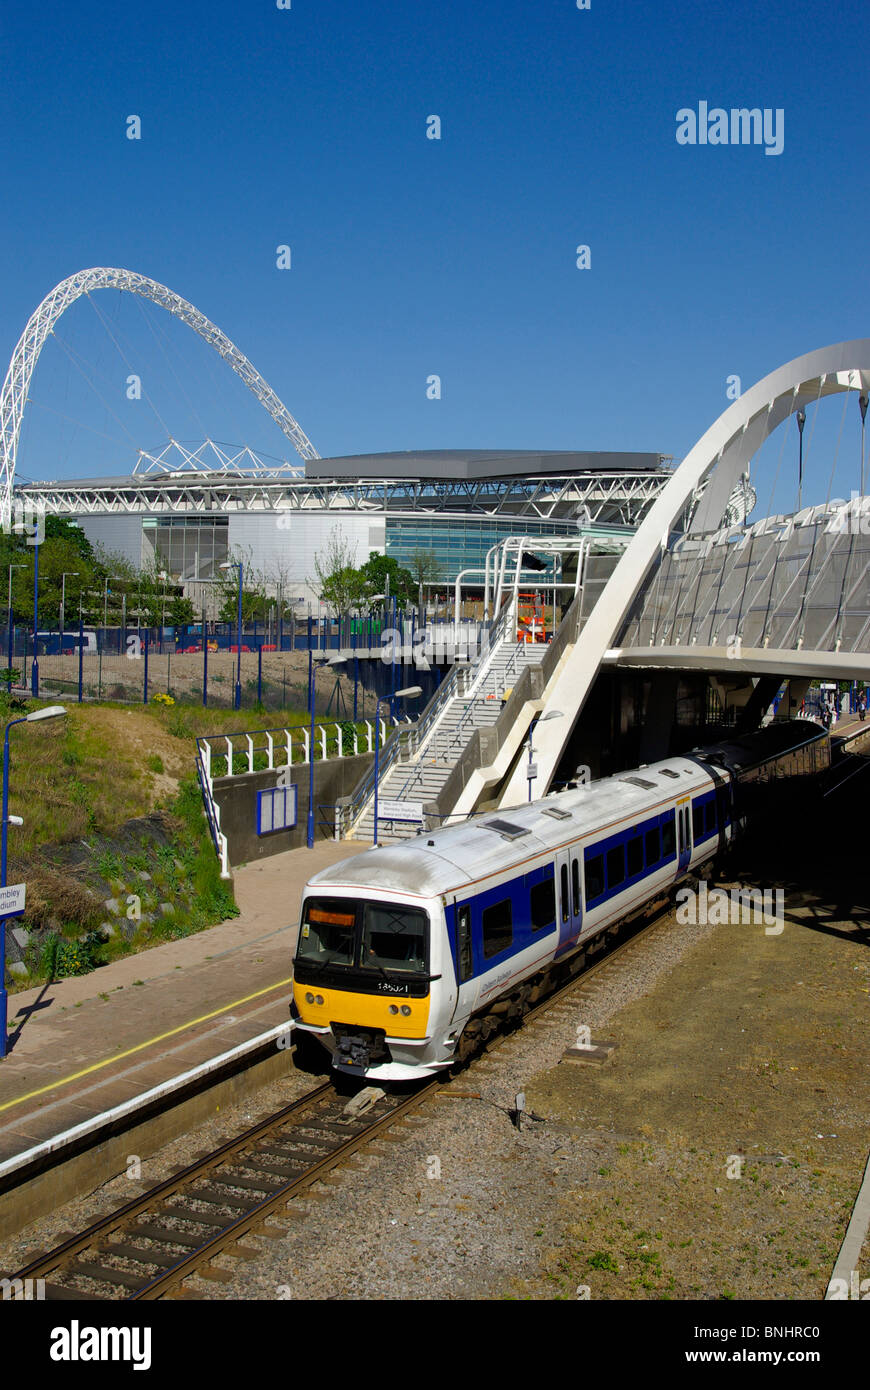 Wembley Roof Amp Image Information